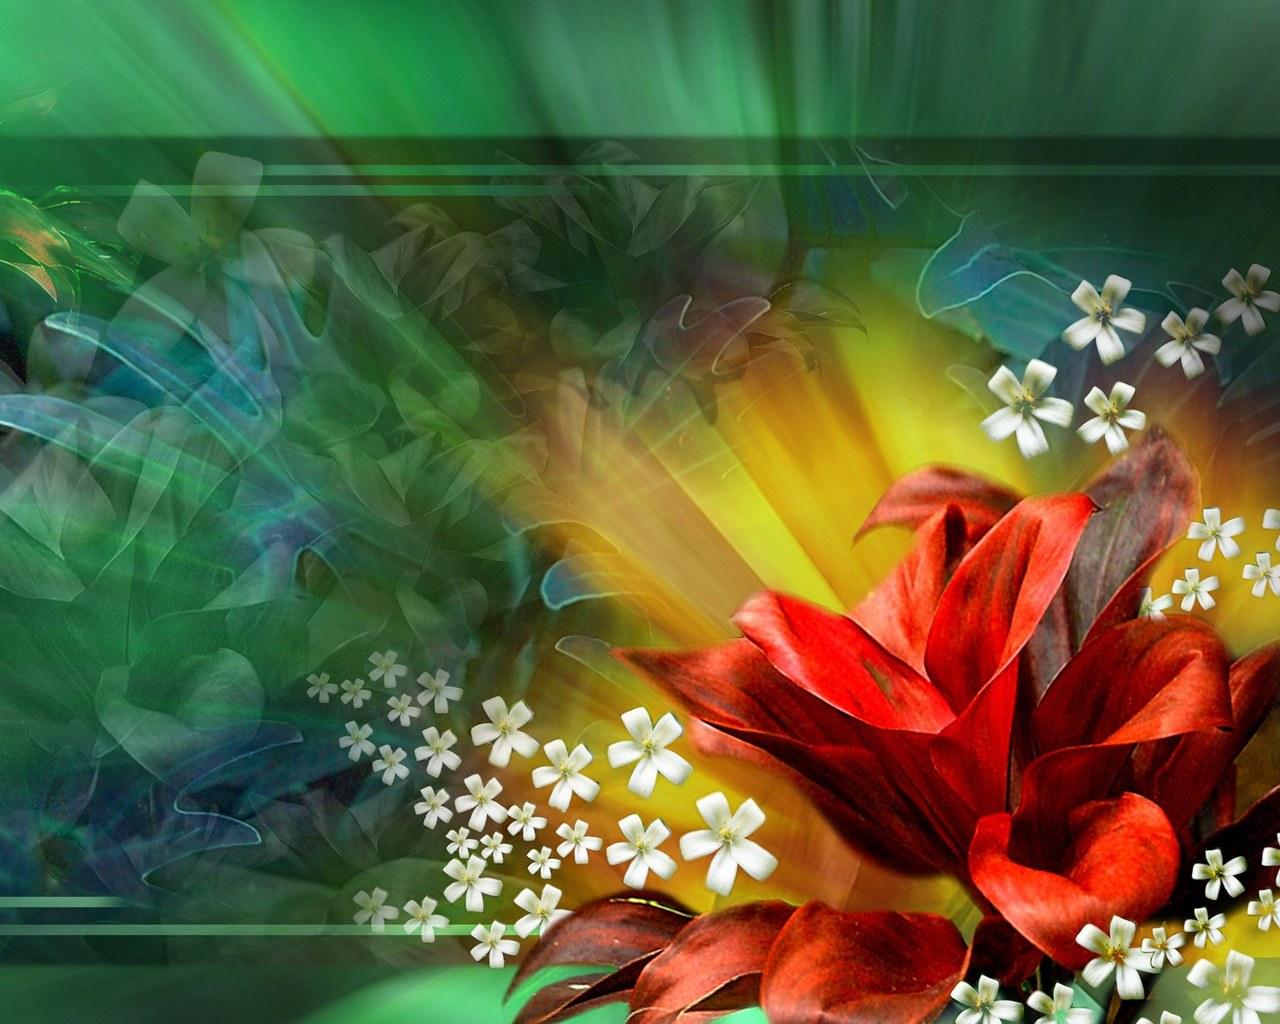 free animated desktop wallpaper Animated Desktop Wallpaper 1280x1024